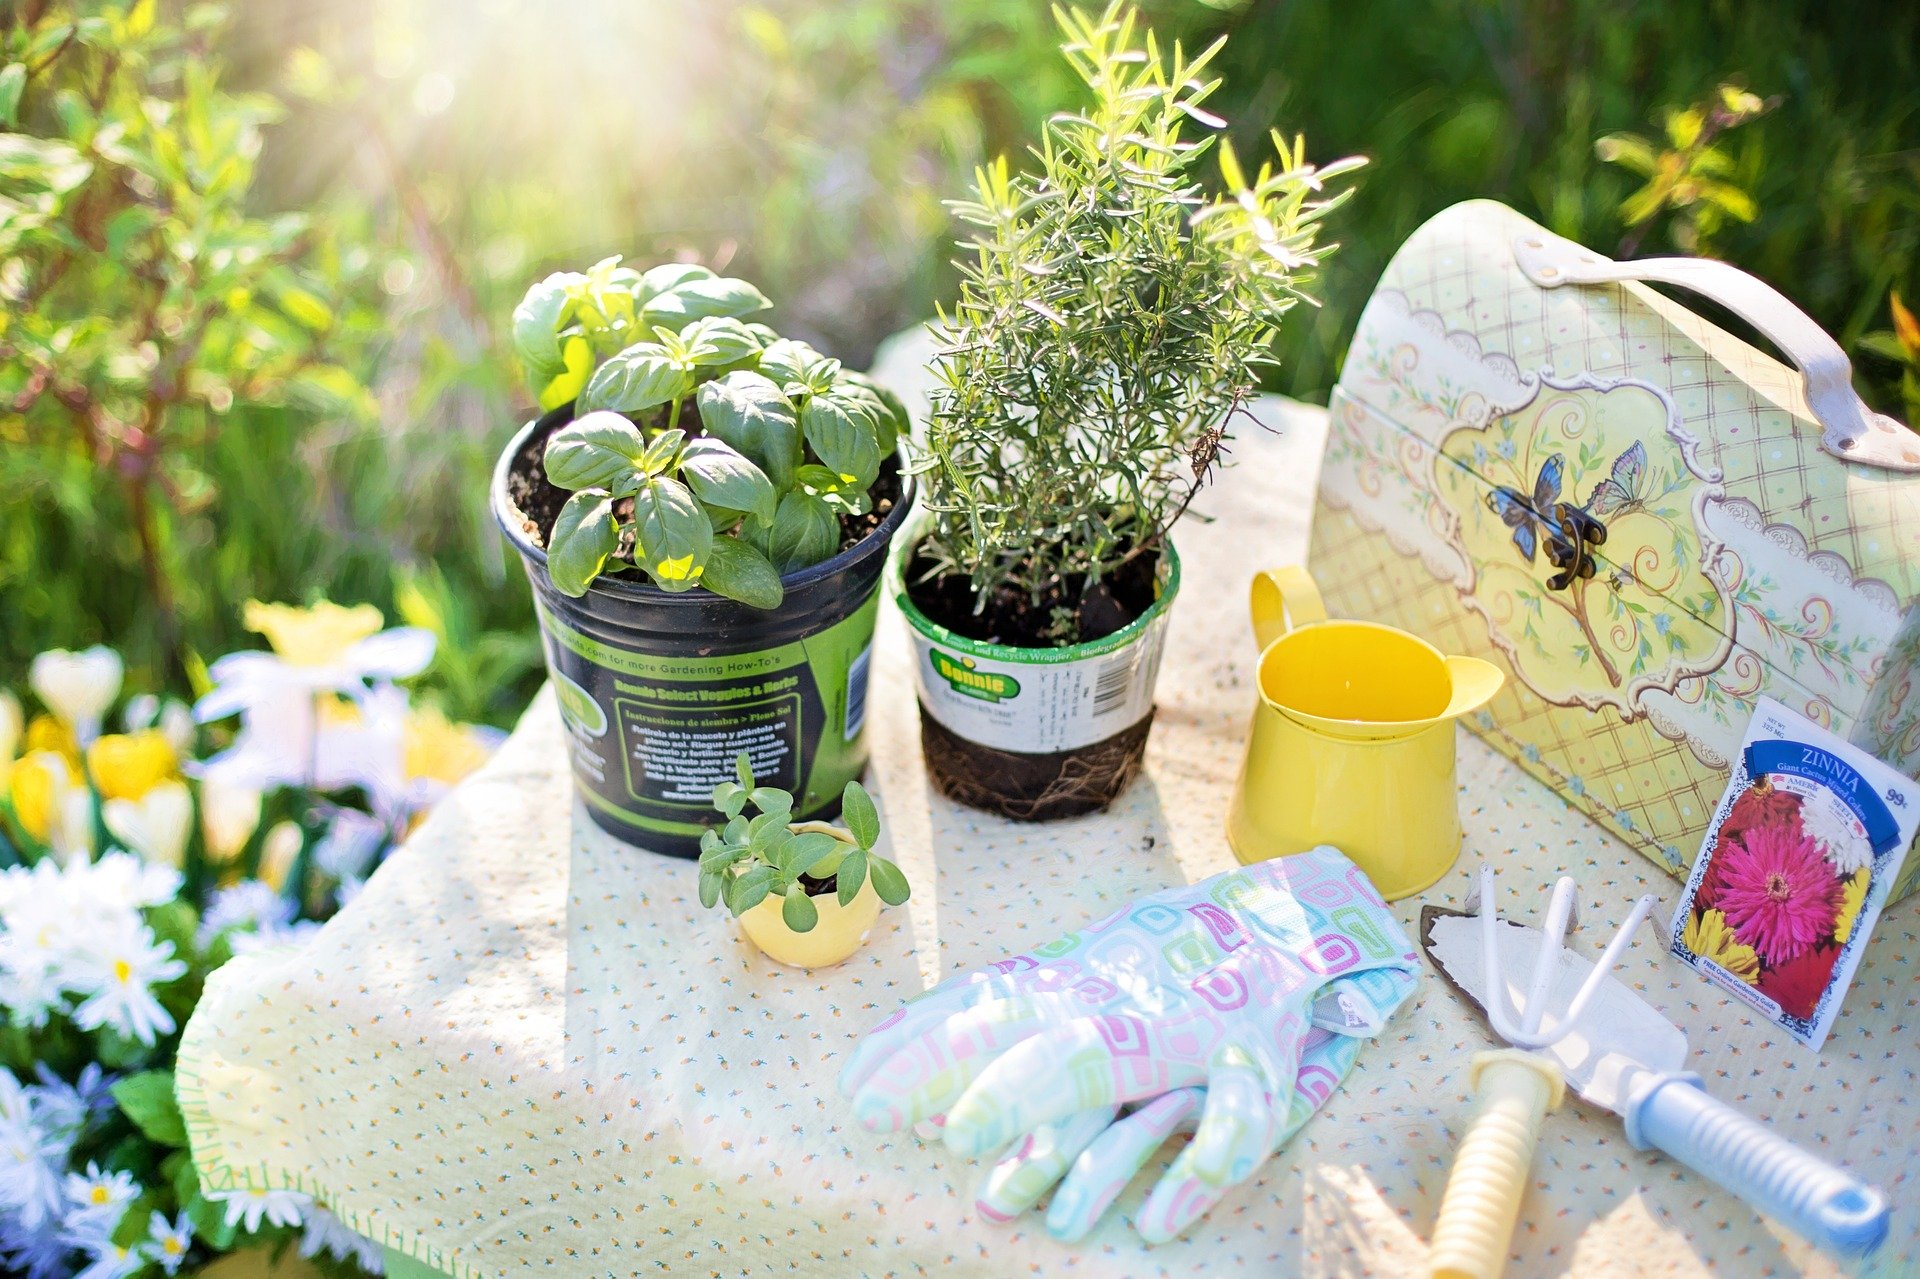 using herbs for medicinal purposes